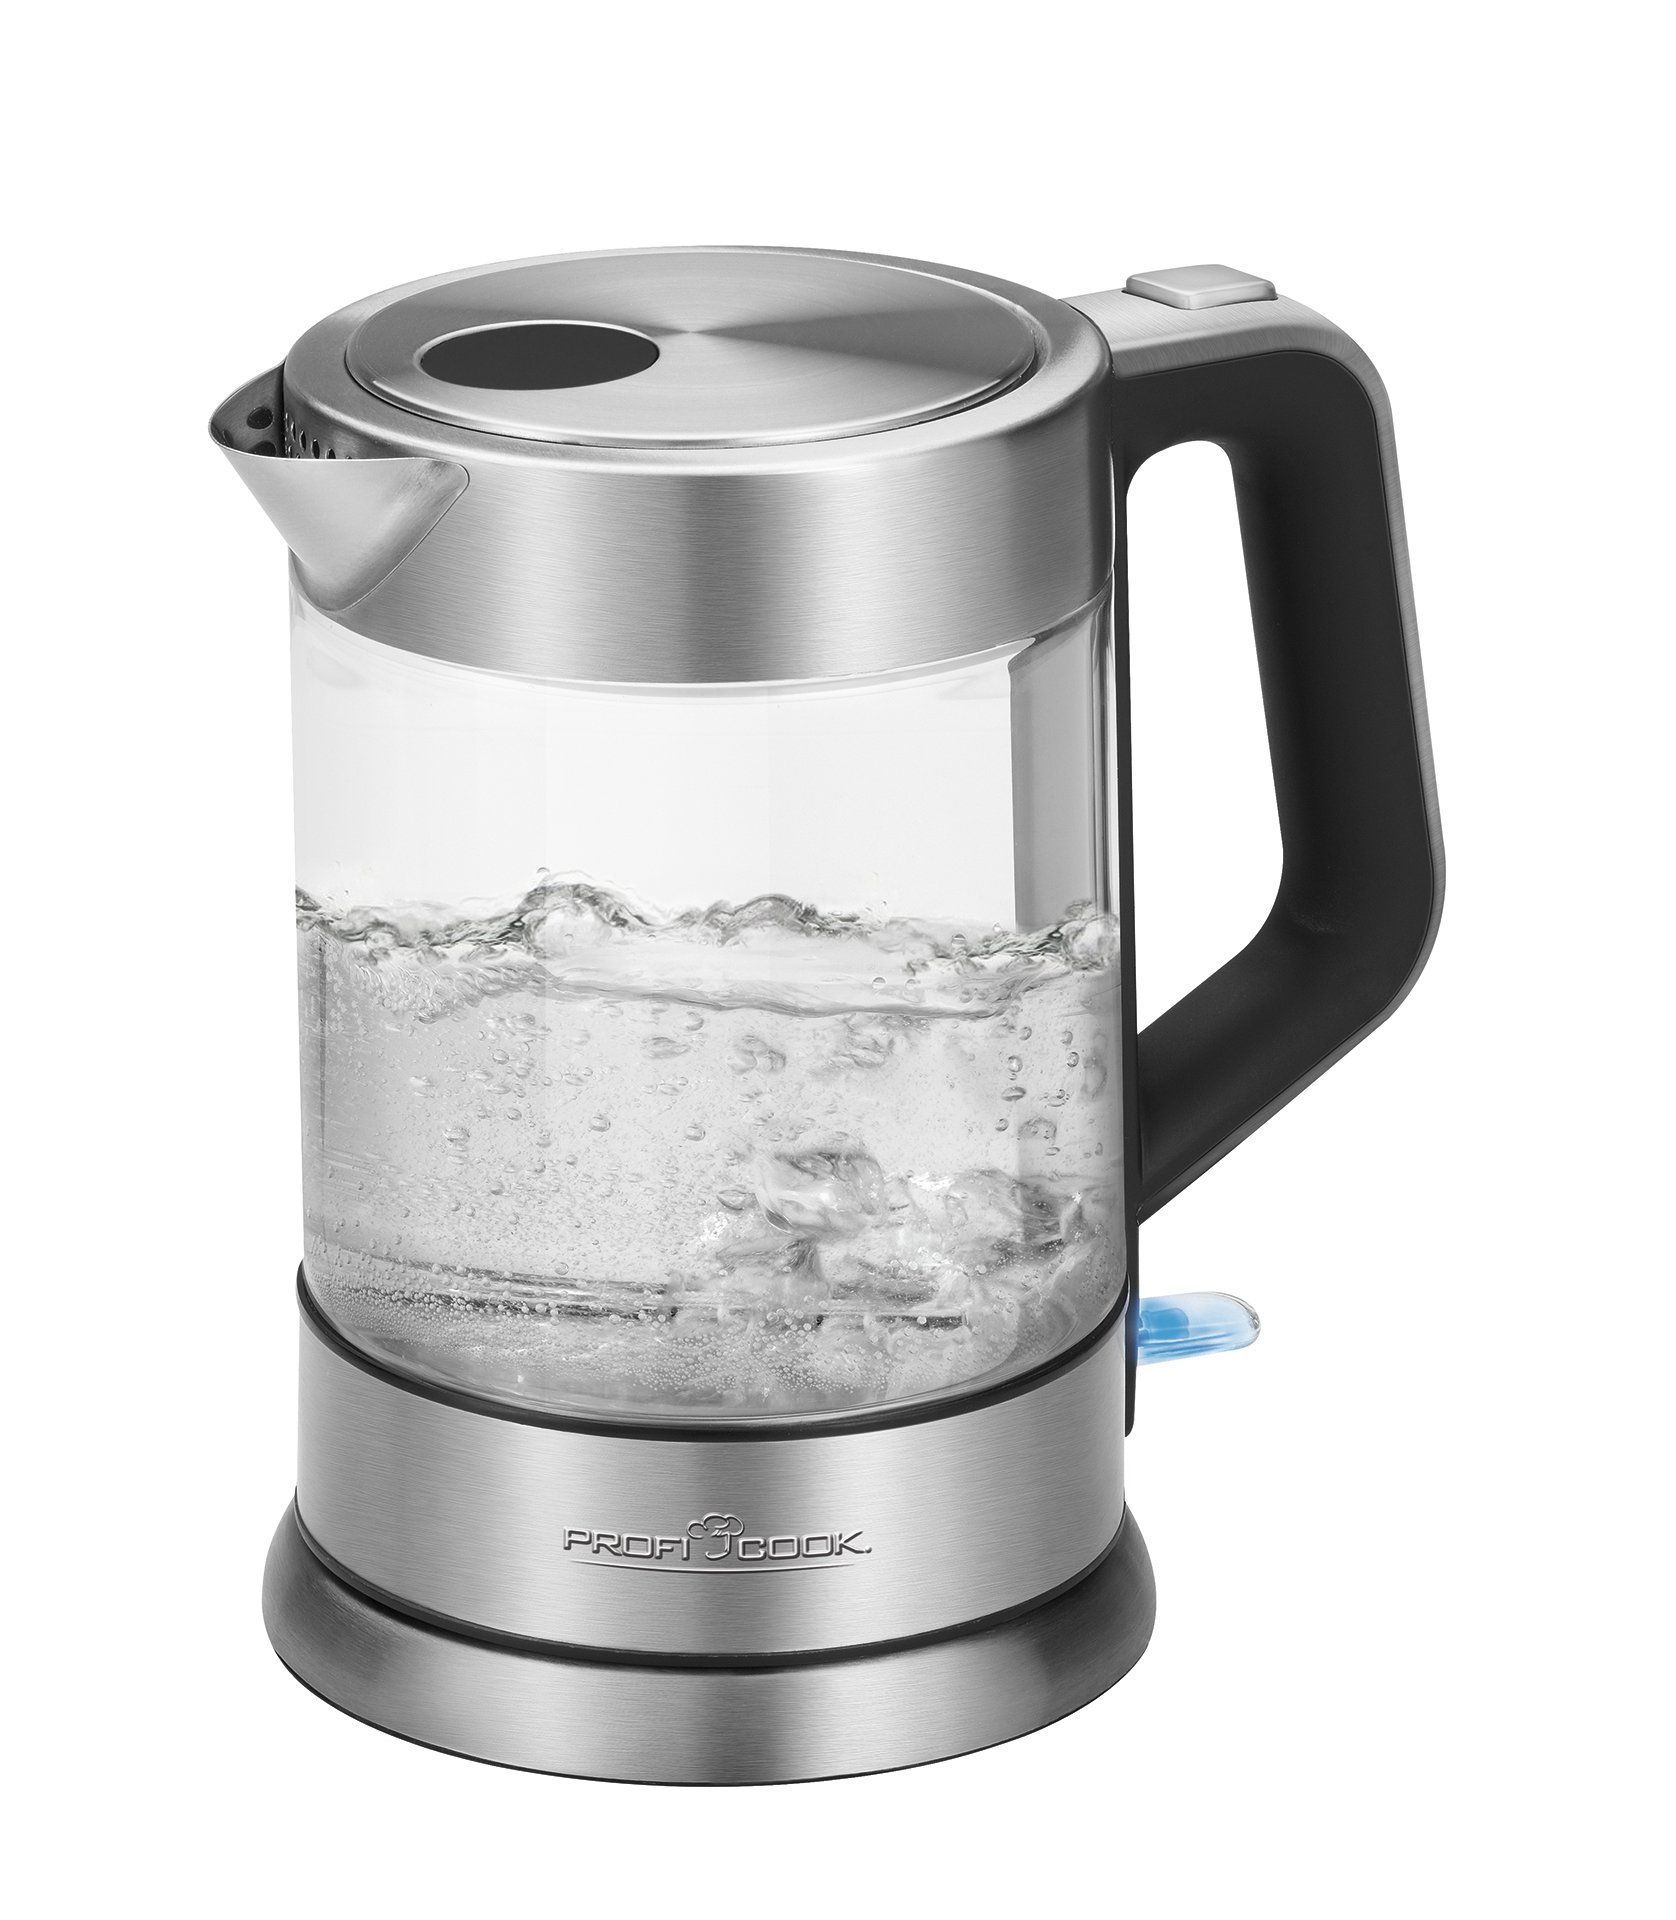 PROFICOOK Wasserkocher kabellos 1,7 Liter Edelstahl PC WKS